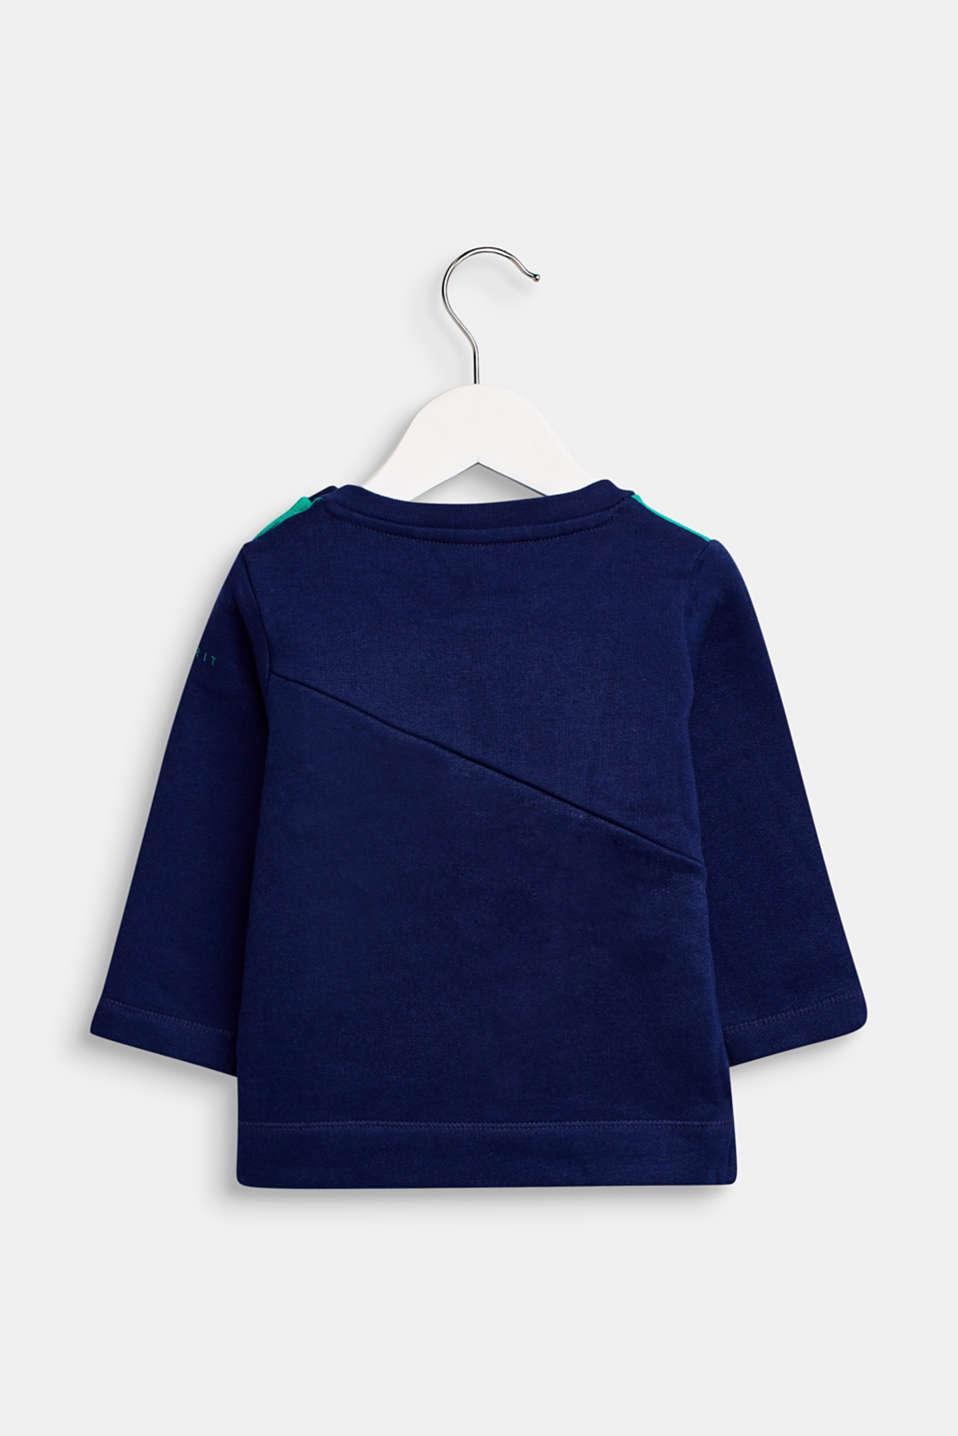 Sweatshirt with an eye print, LCMARINE BLUE, detail image number 1